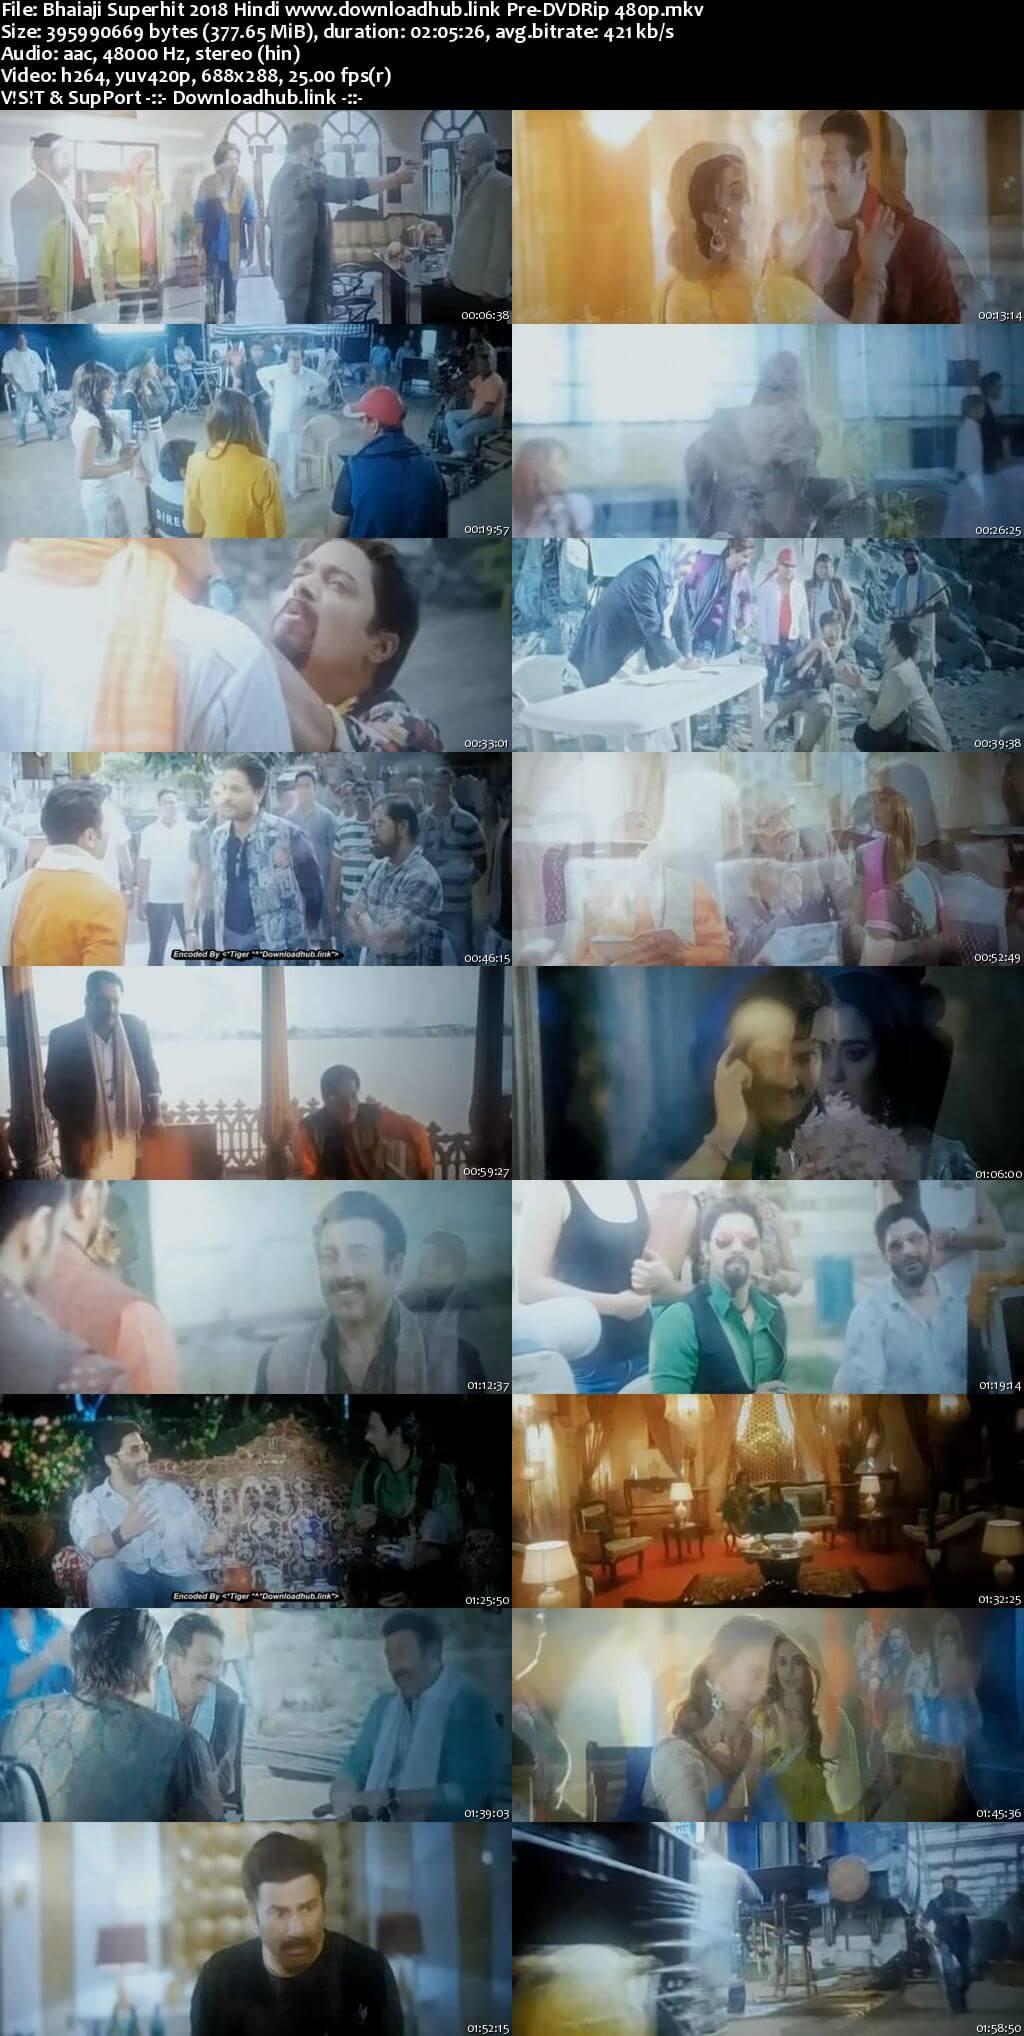 Bhaiaji Superhit 2018 Hindi 350MB Pre-DVDRip 480p